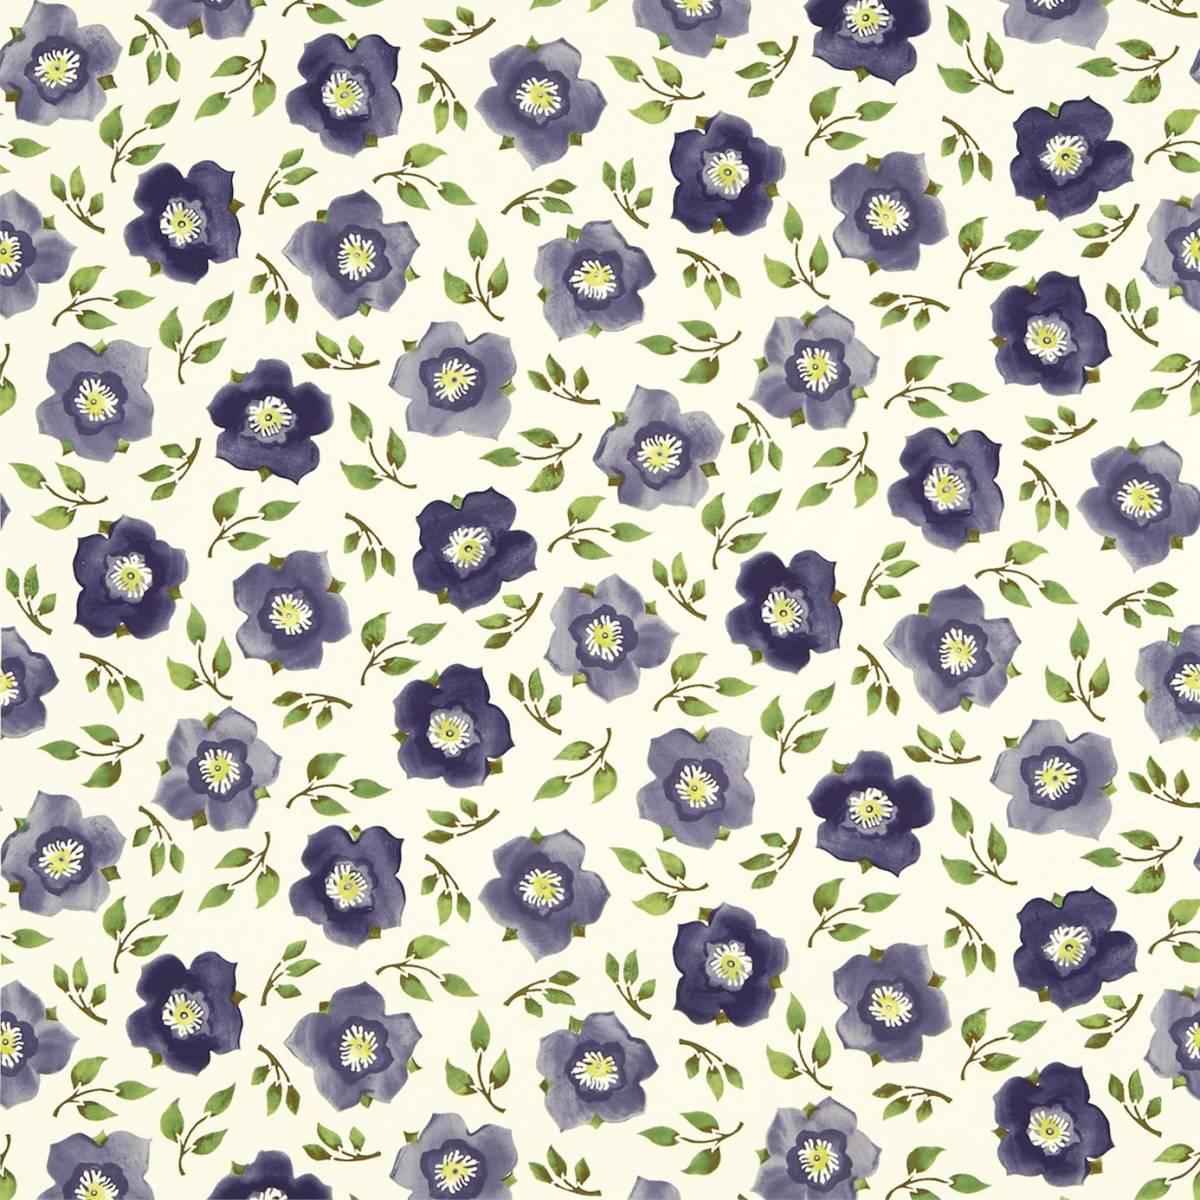 Hellebore China Fabric  PurpleGreen 223434  Sanderson Emma Bridgewater Fabrics  Wallpapers